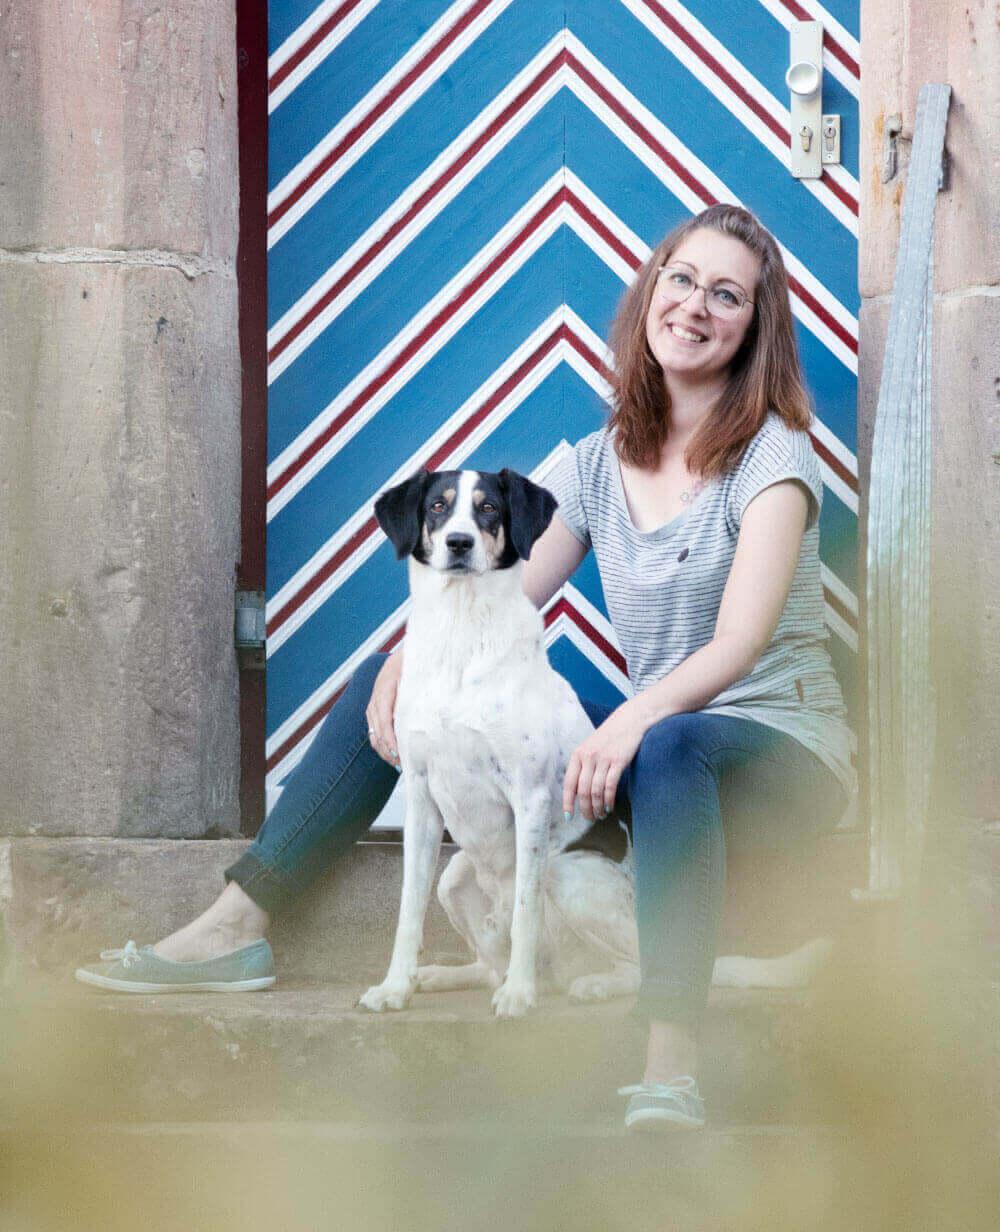 Tanja und Olaf vom DIY Hundeblog Herr Olaf